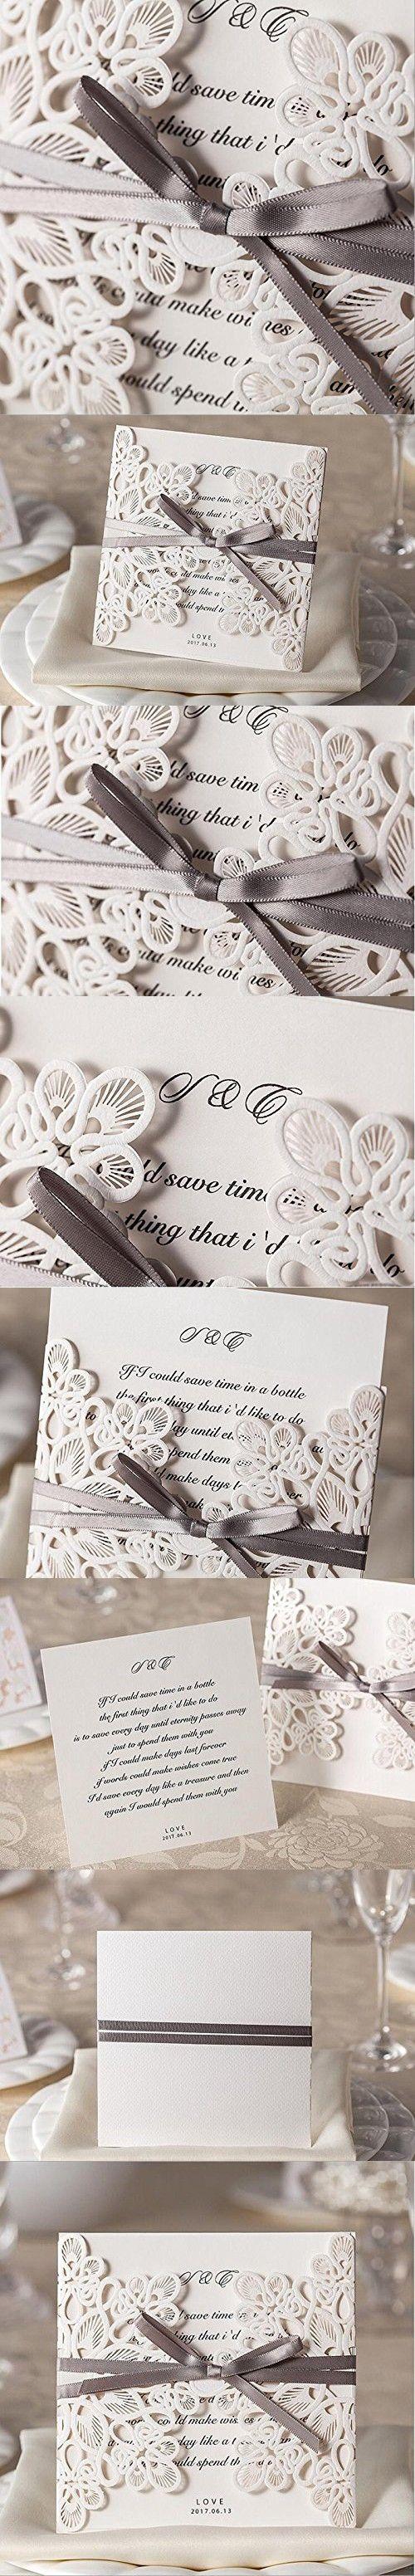 Best 25 Square wedding invitations ideas – Wedding Invitation Card Stock Kits